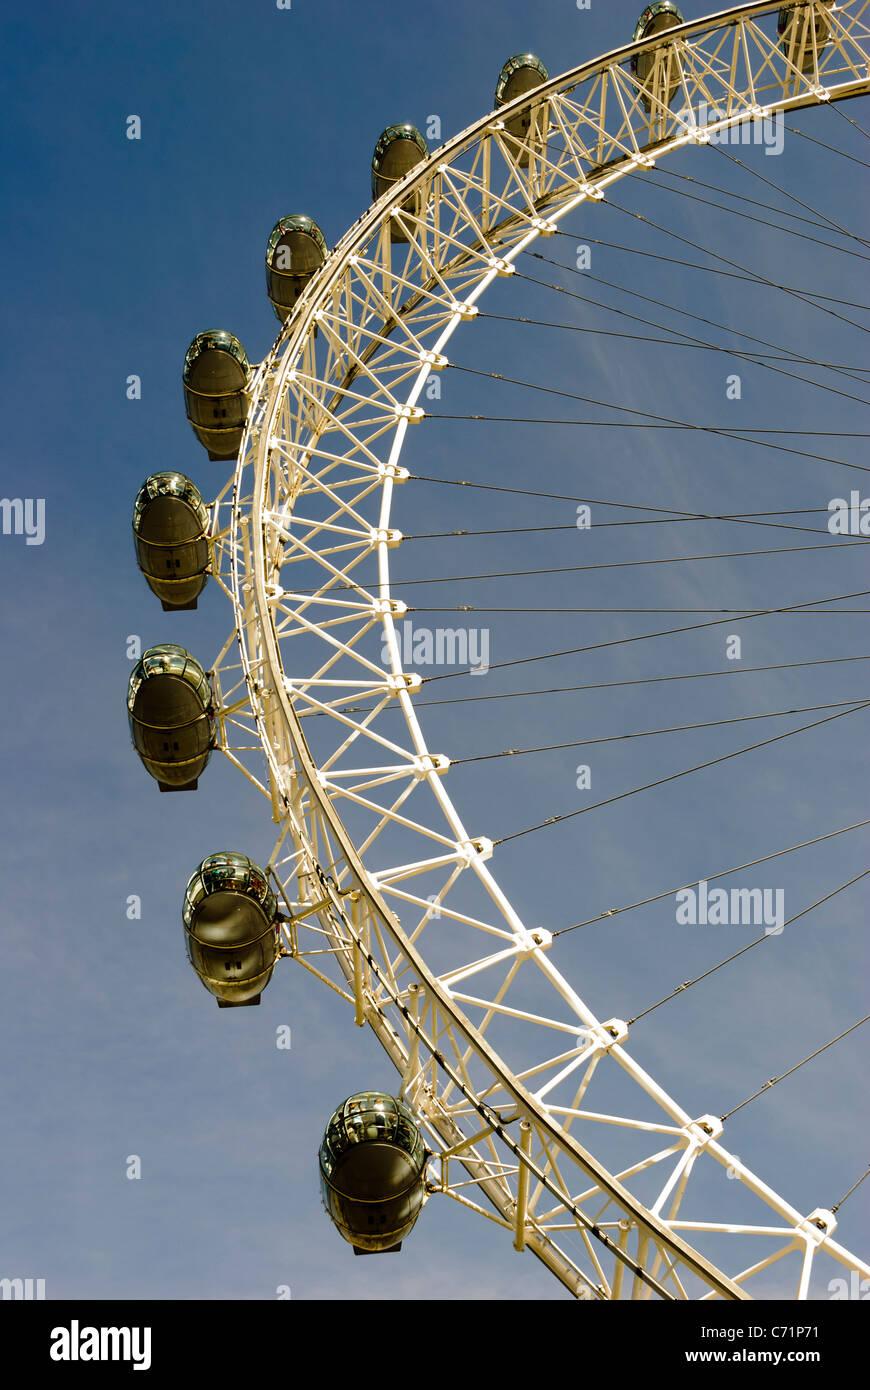 Capsule of the London eye - London, England - Stock Image